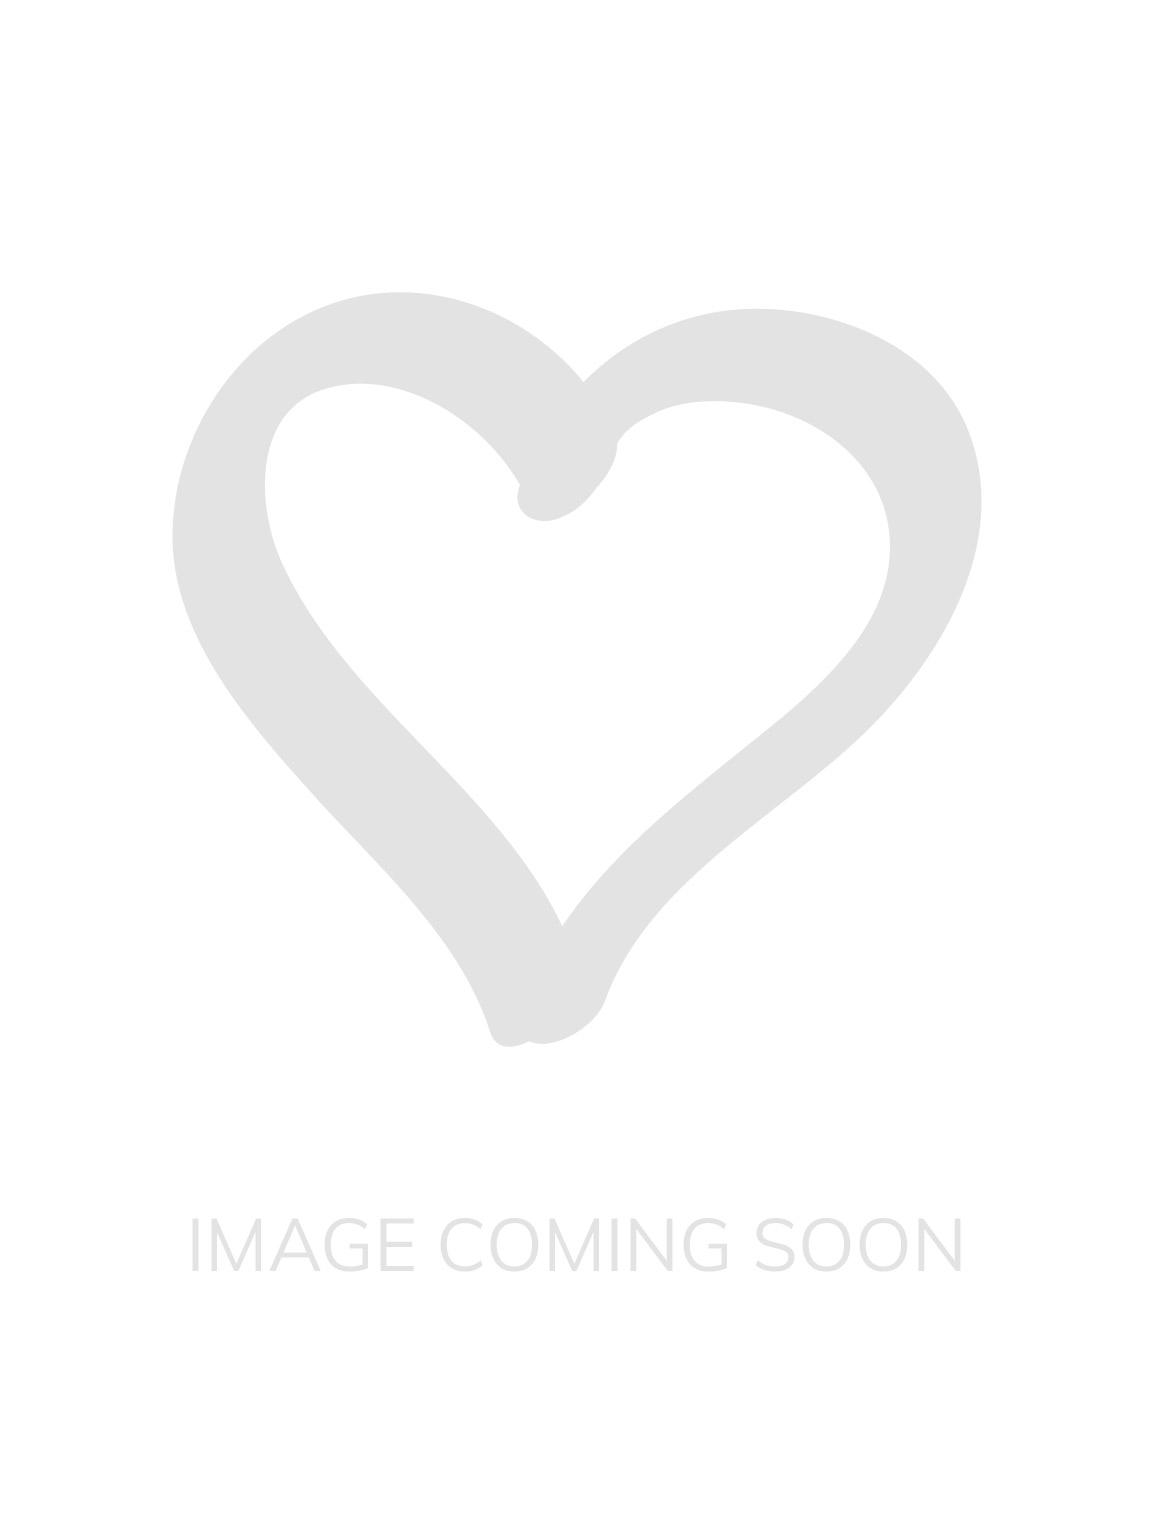 Precision 16 Black Extended 45mm Bolts and Locks for ƁMW 5 Series upto 2011 Models PN.SFP-16BM1745B+B1745B113